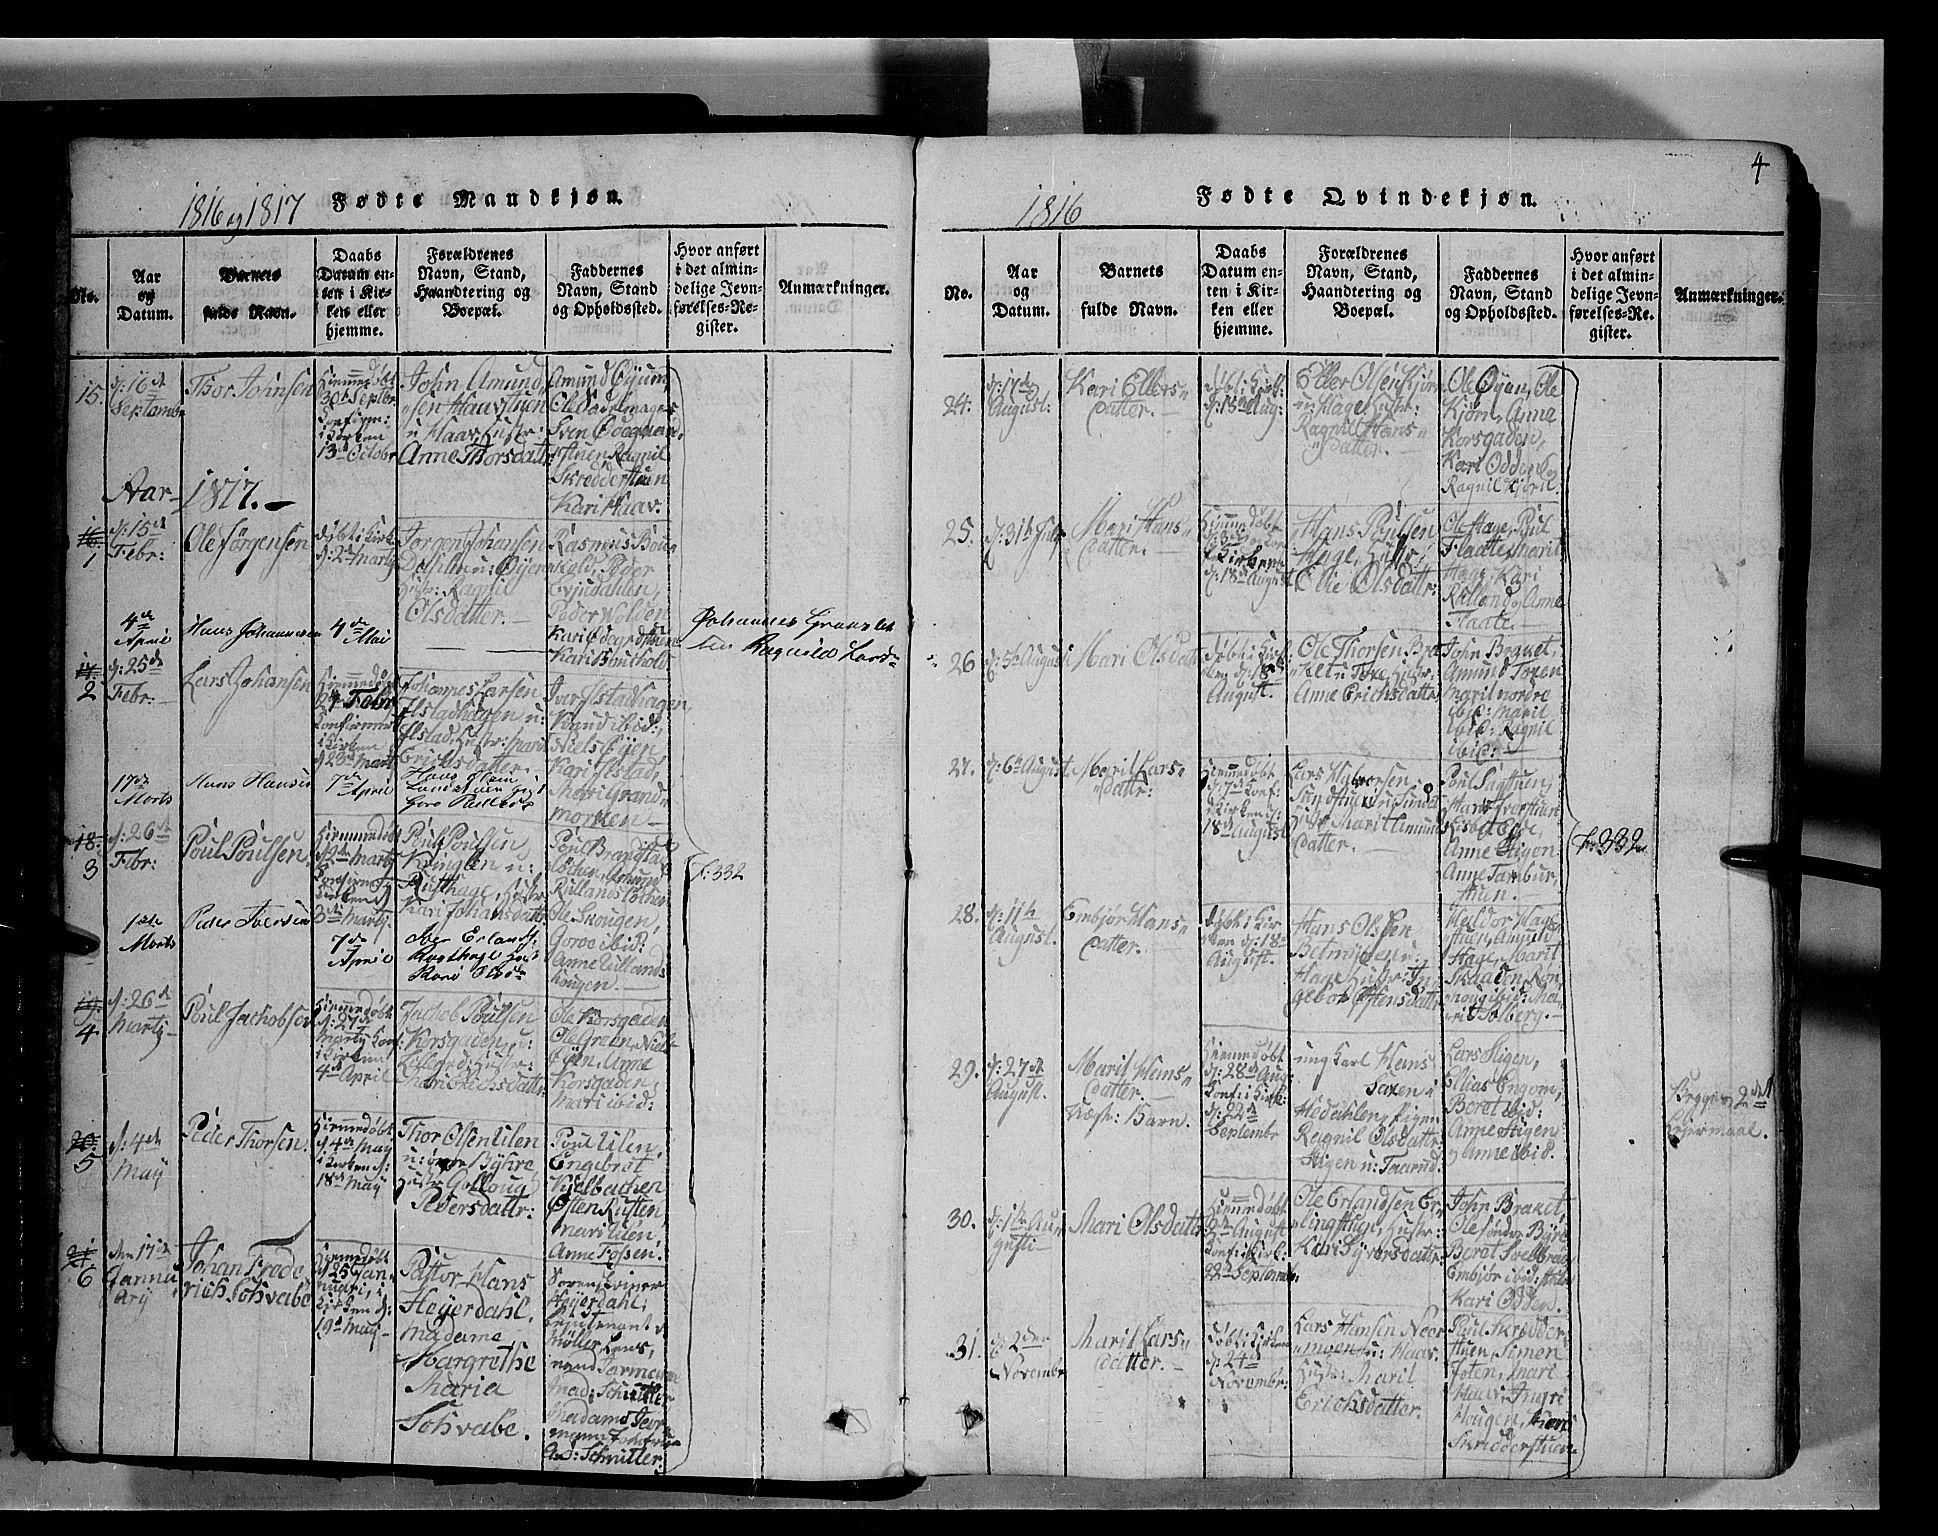 SAH, Fron prestekontor, H/Ha/Hab/L0004: Klokkerbok nr. 4, 1816-1850, s. 4